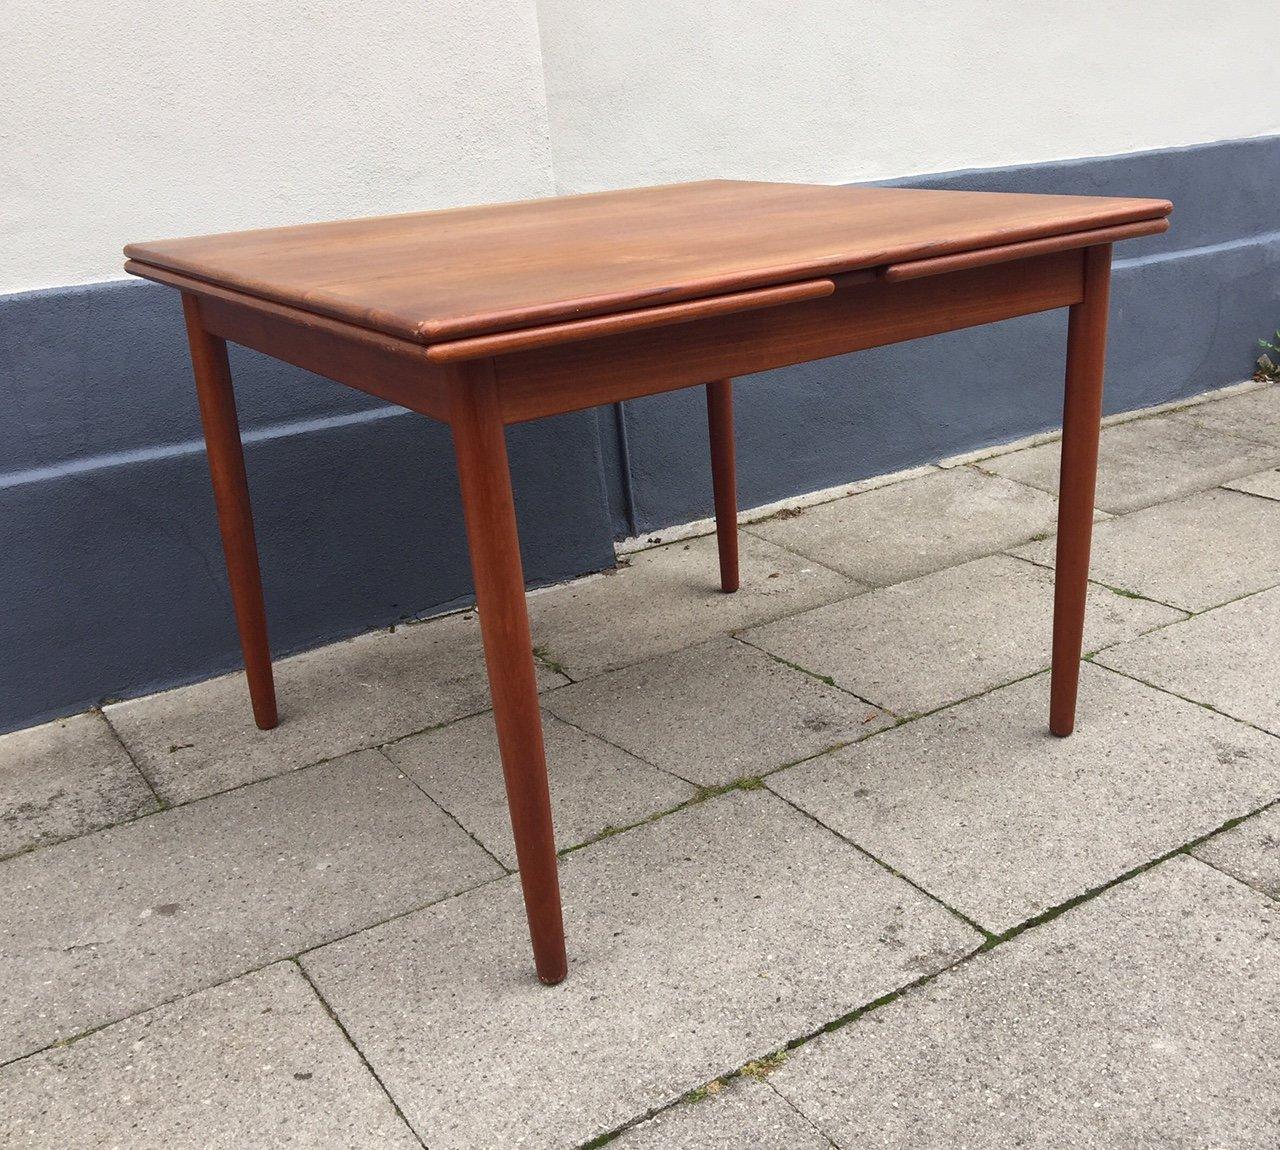 Danish Mid Century Extendable Teak Dining Table From